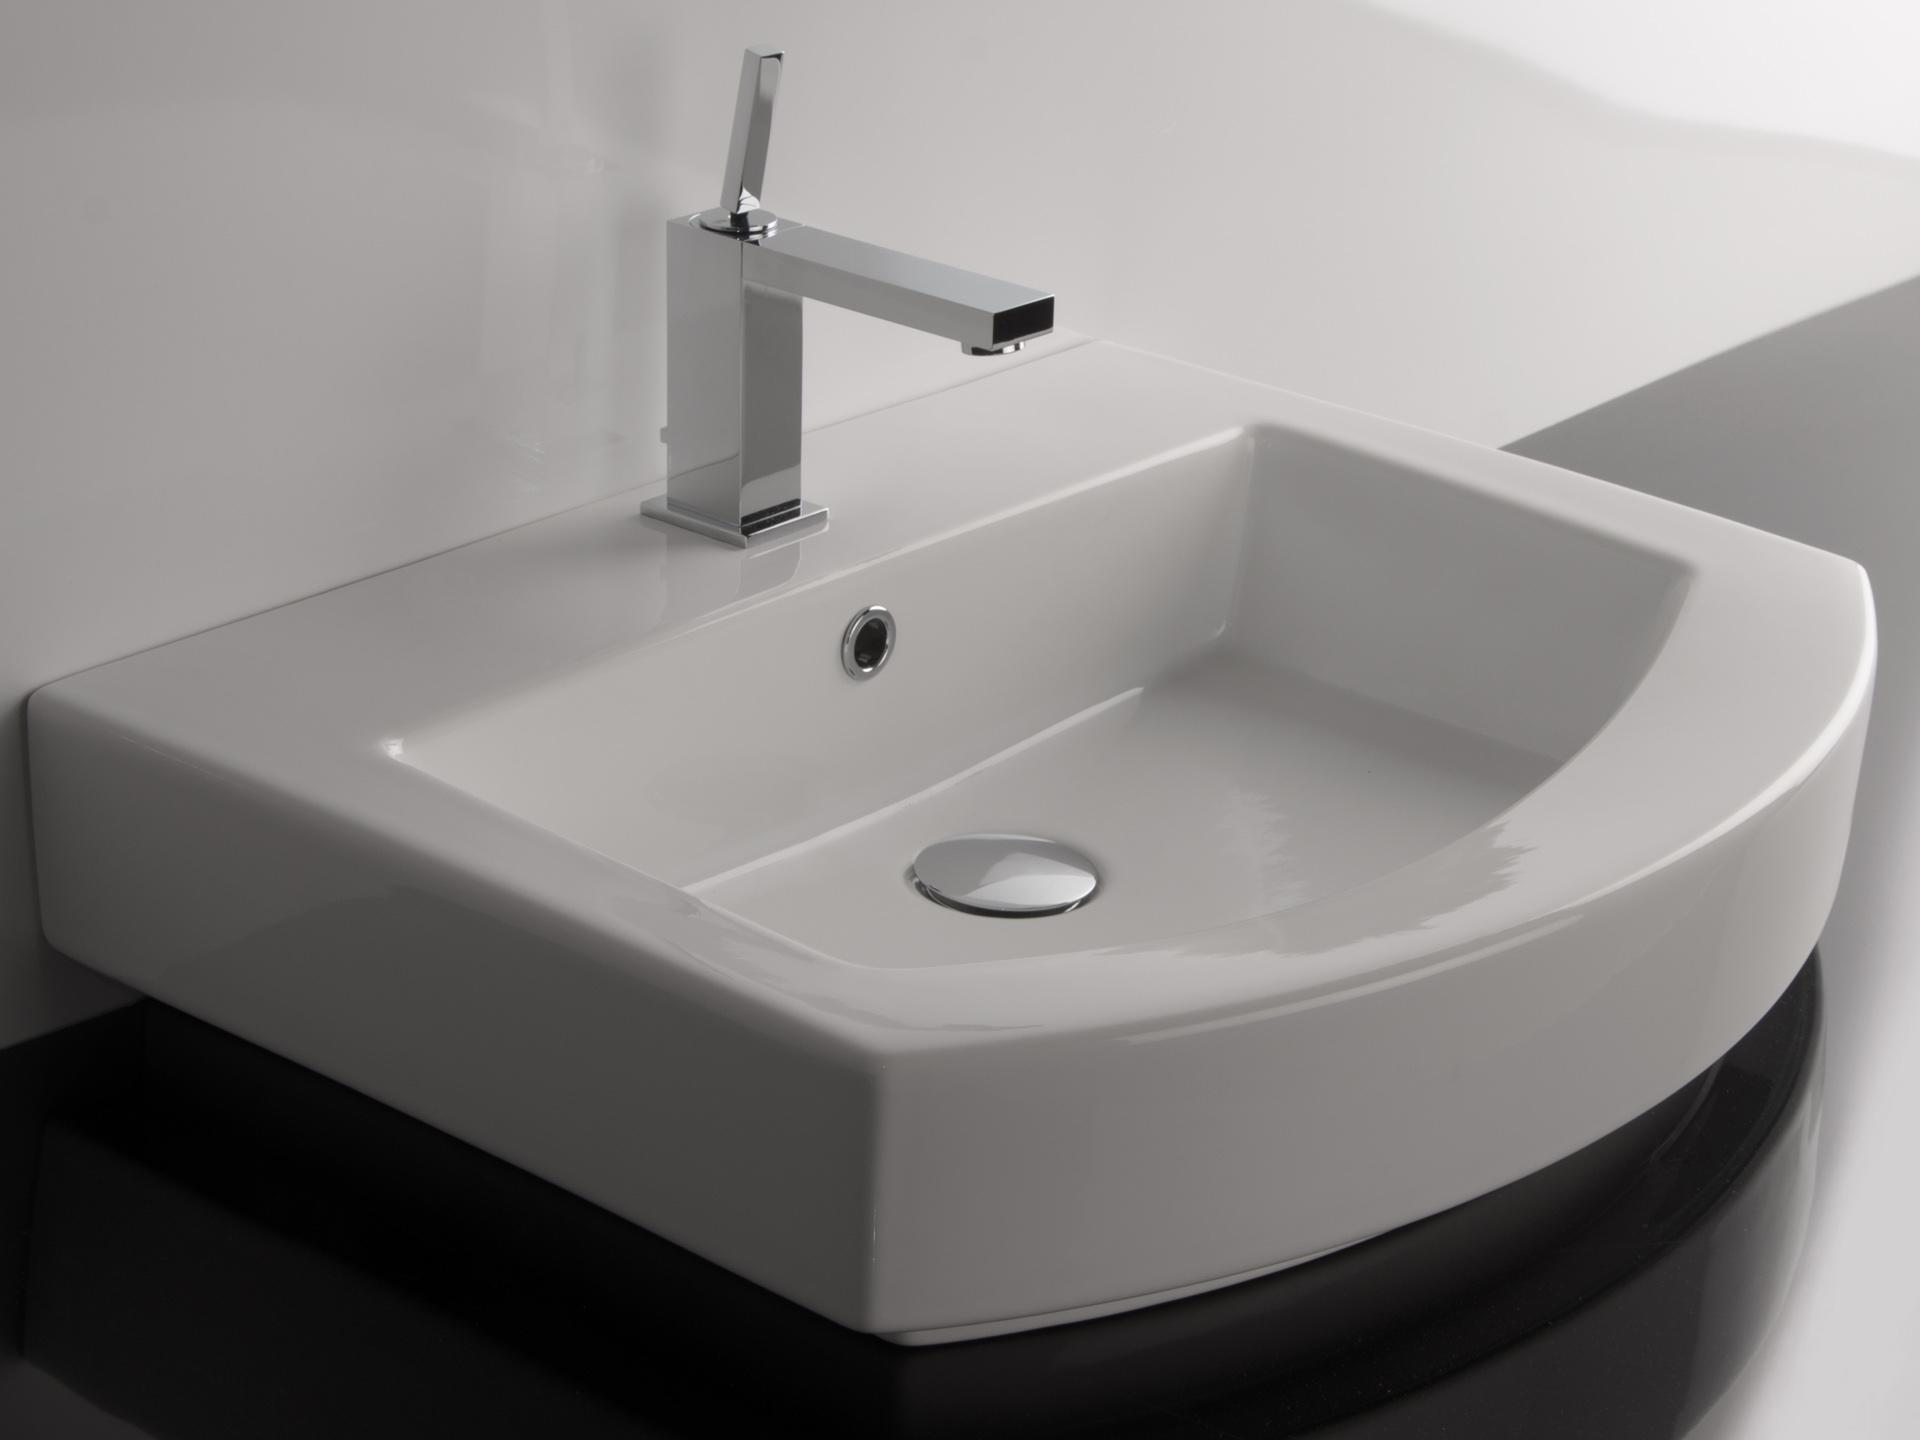 lavabo sospeso moon asimmetrico : Lavabi Sospesi : Lavabo sospeso Moon 60